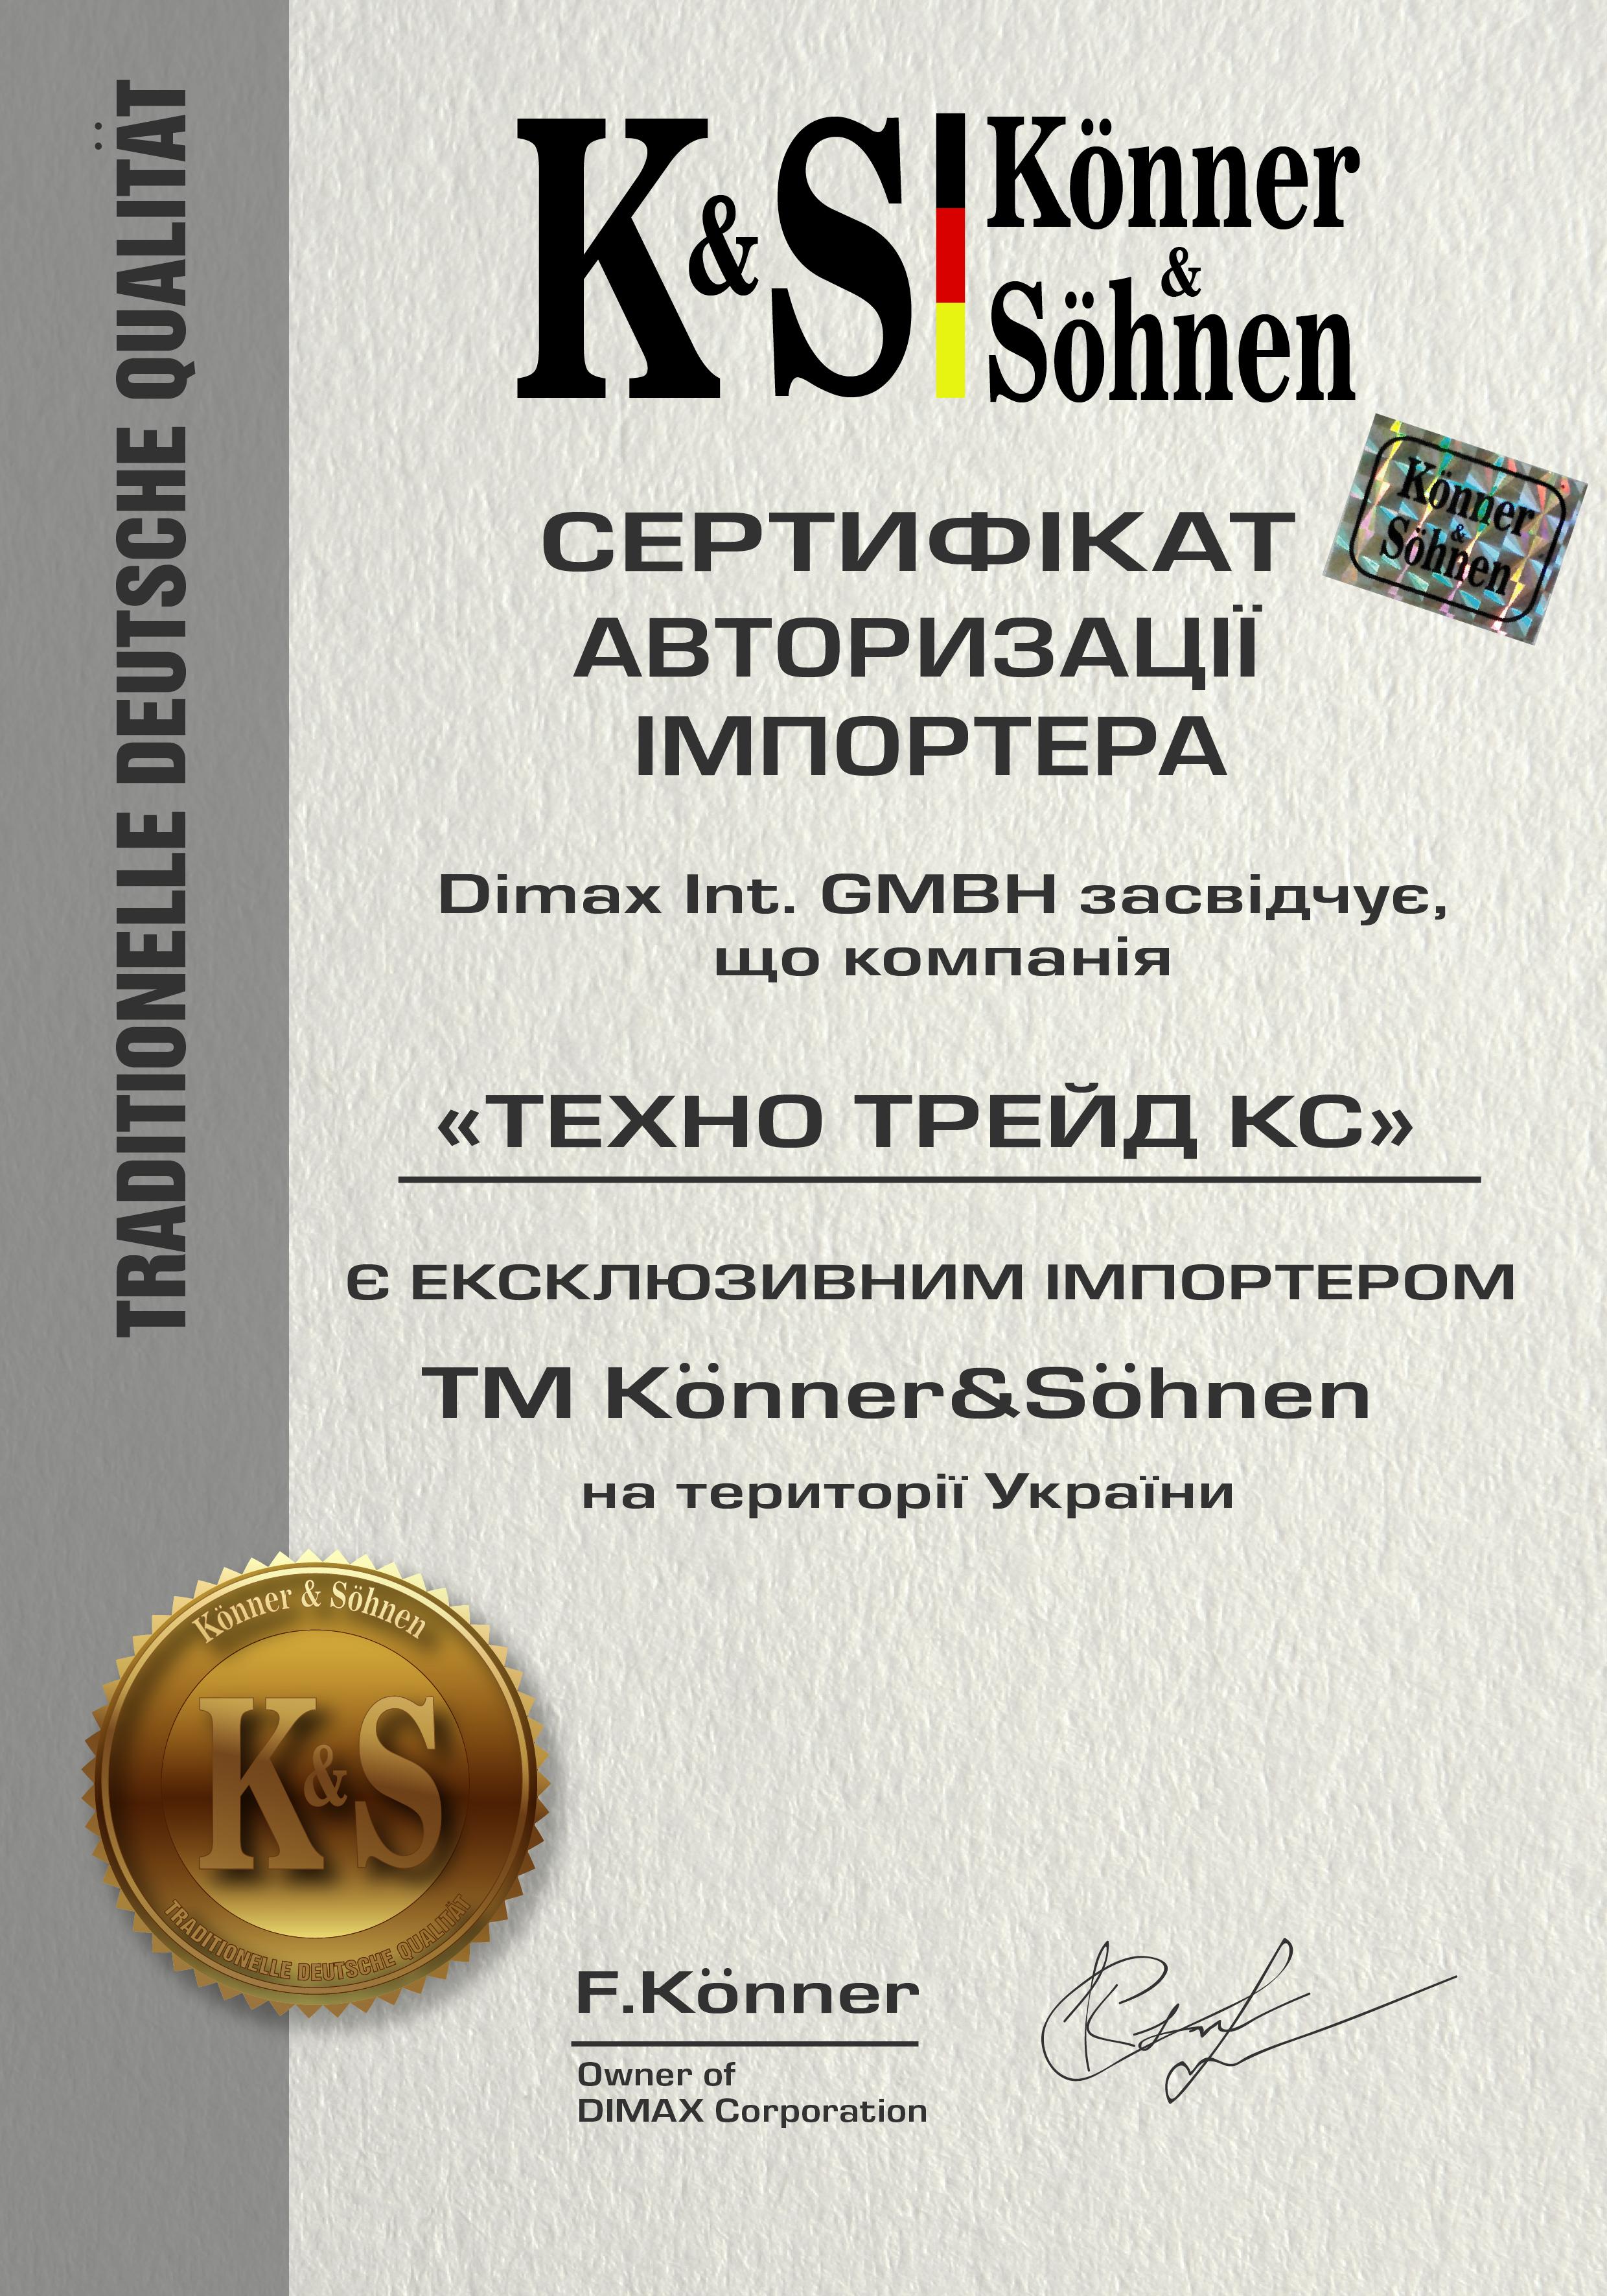 Konner3